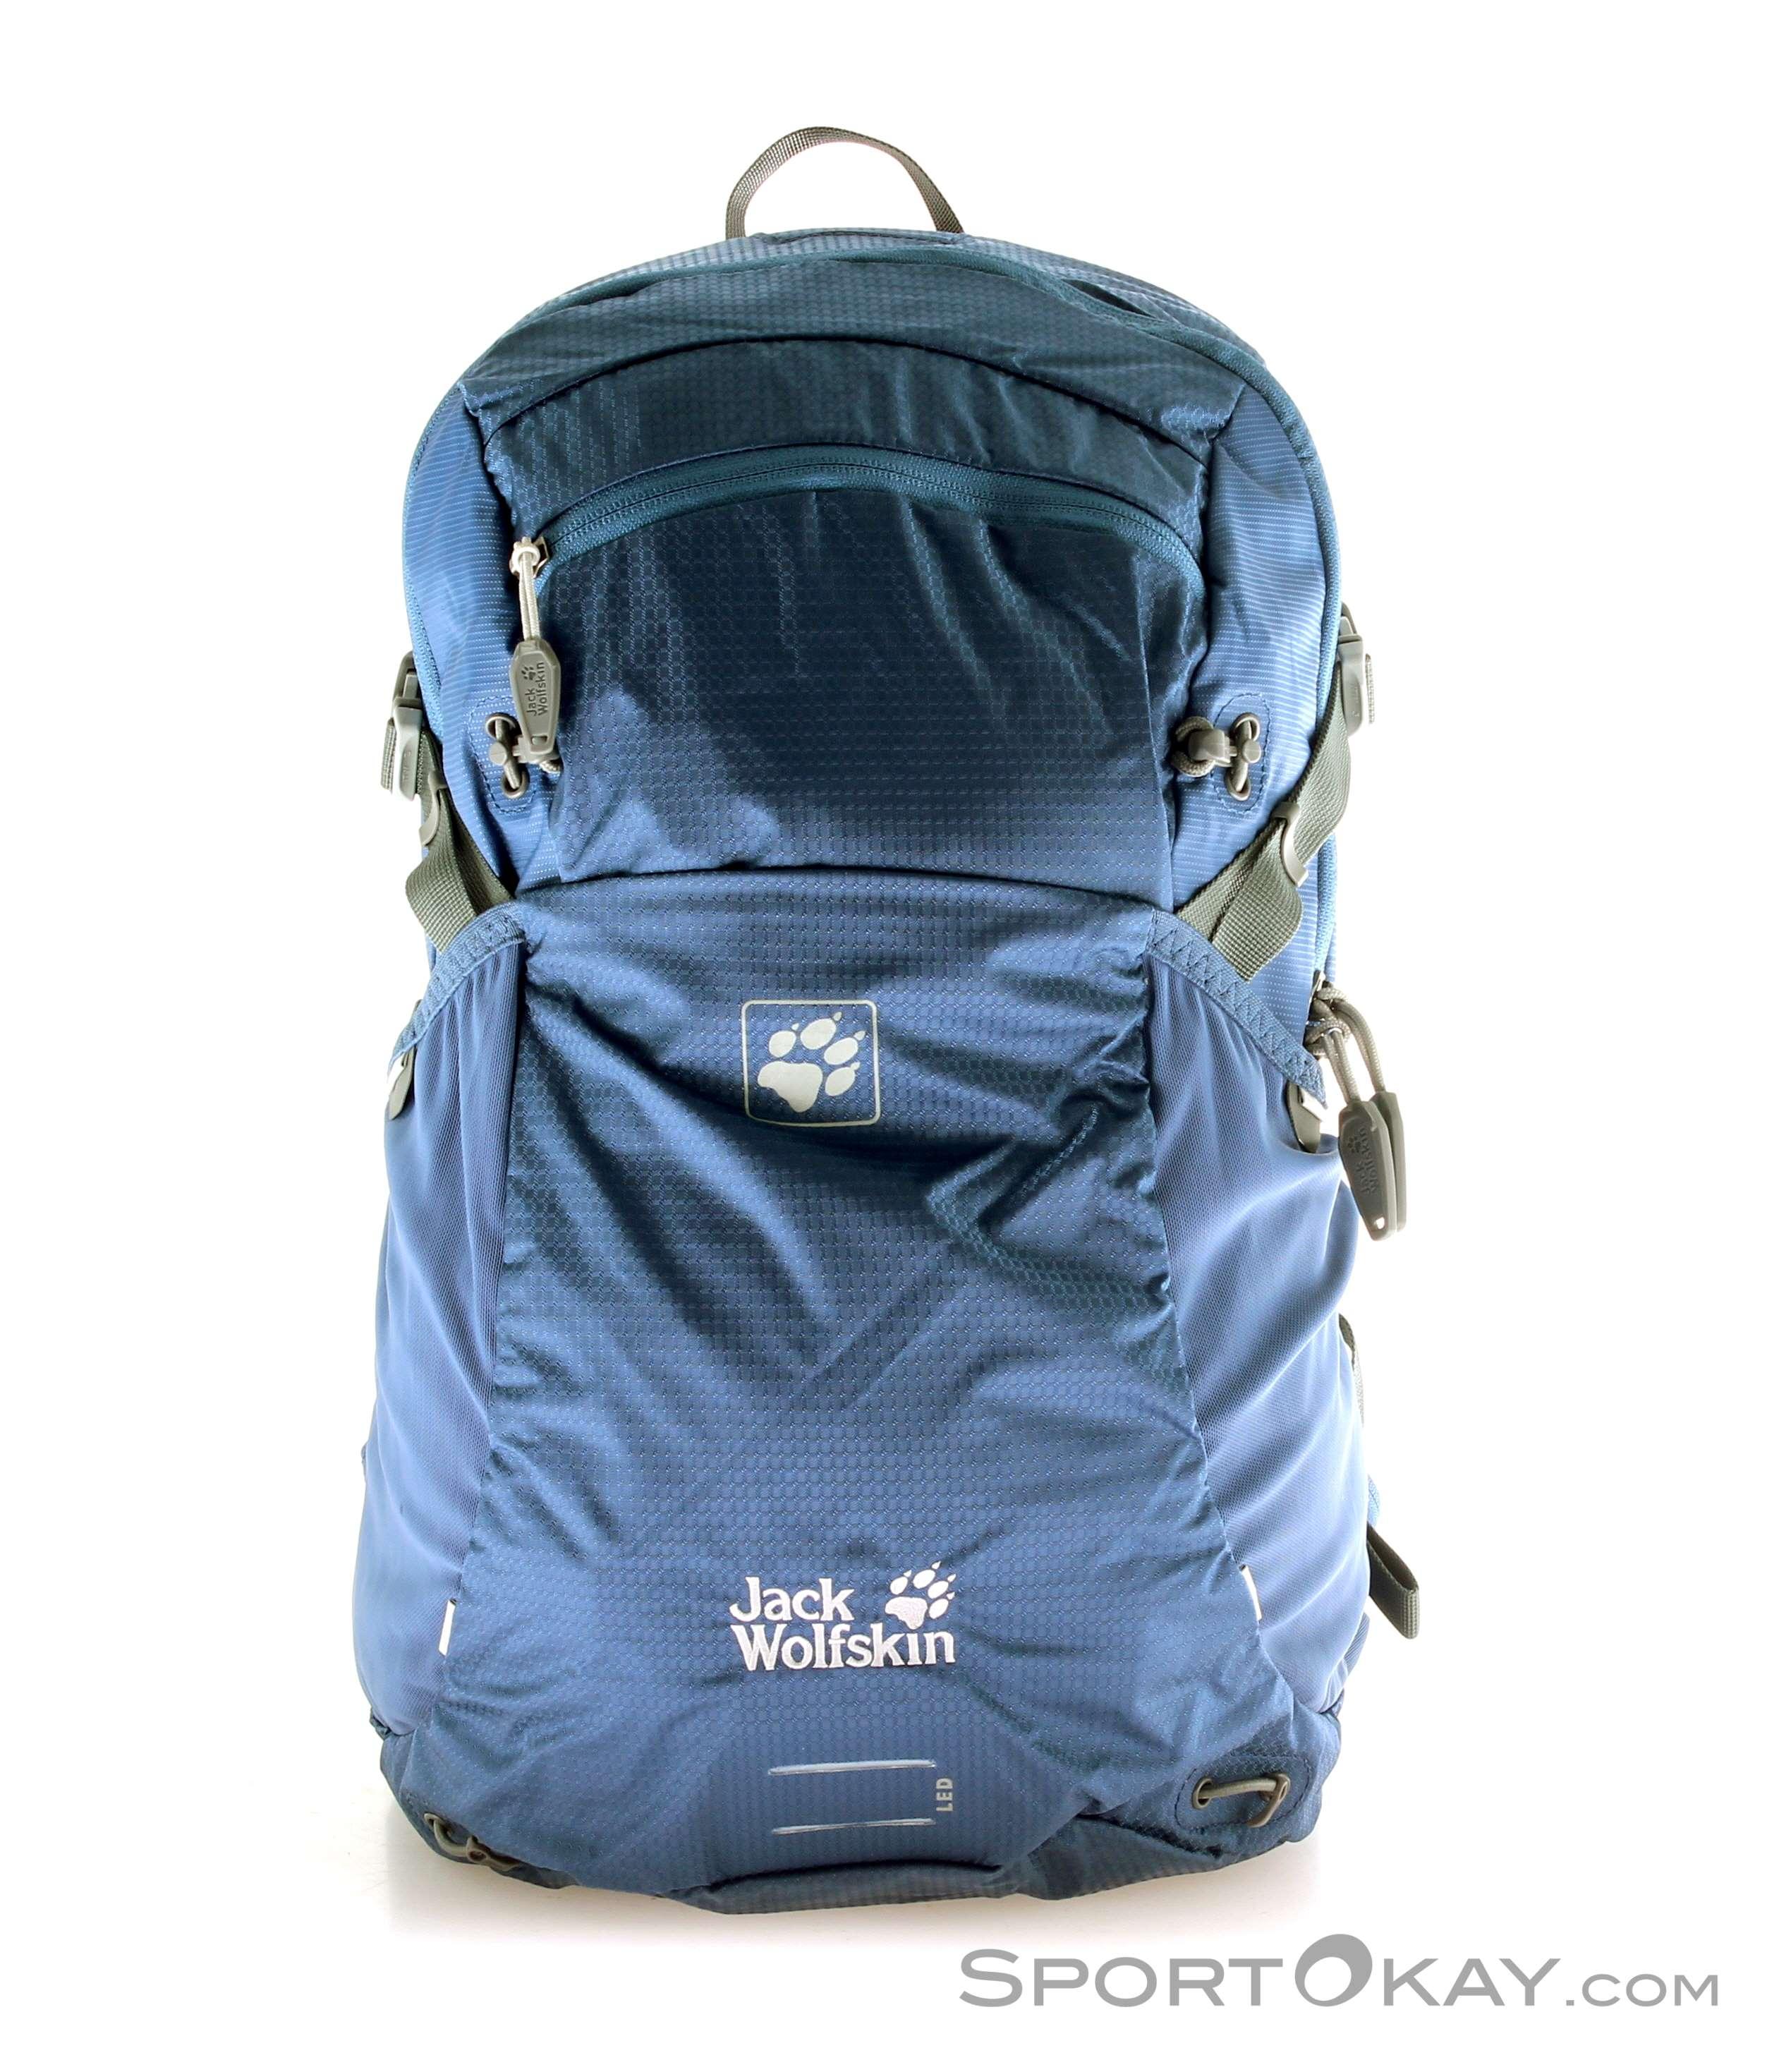 f310575a207 Jack Wolfskin Moab Jam 18l Backpack, Jack Wolfskin, Blue, , Male, 0230